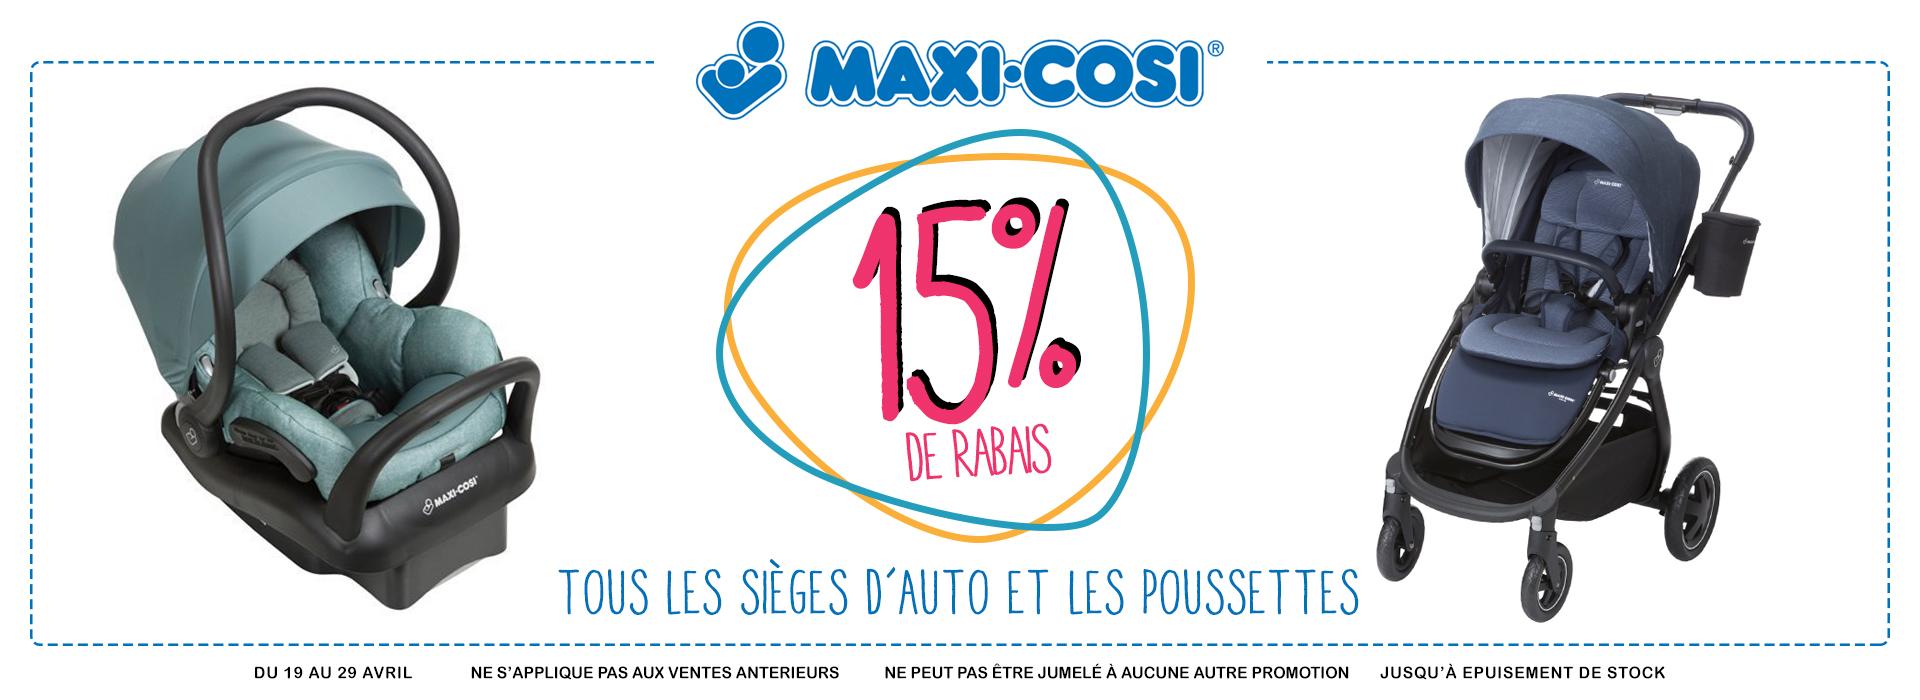 Maxi Cosi Promo